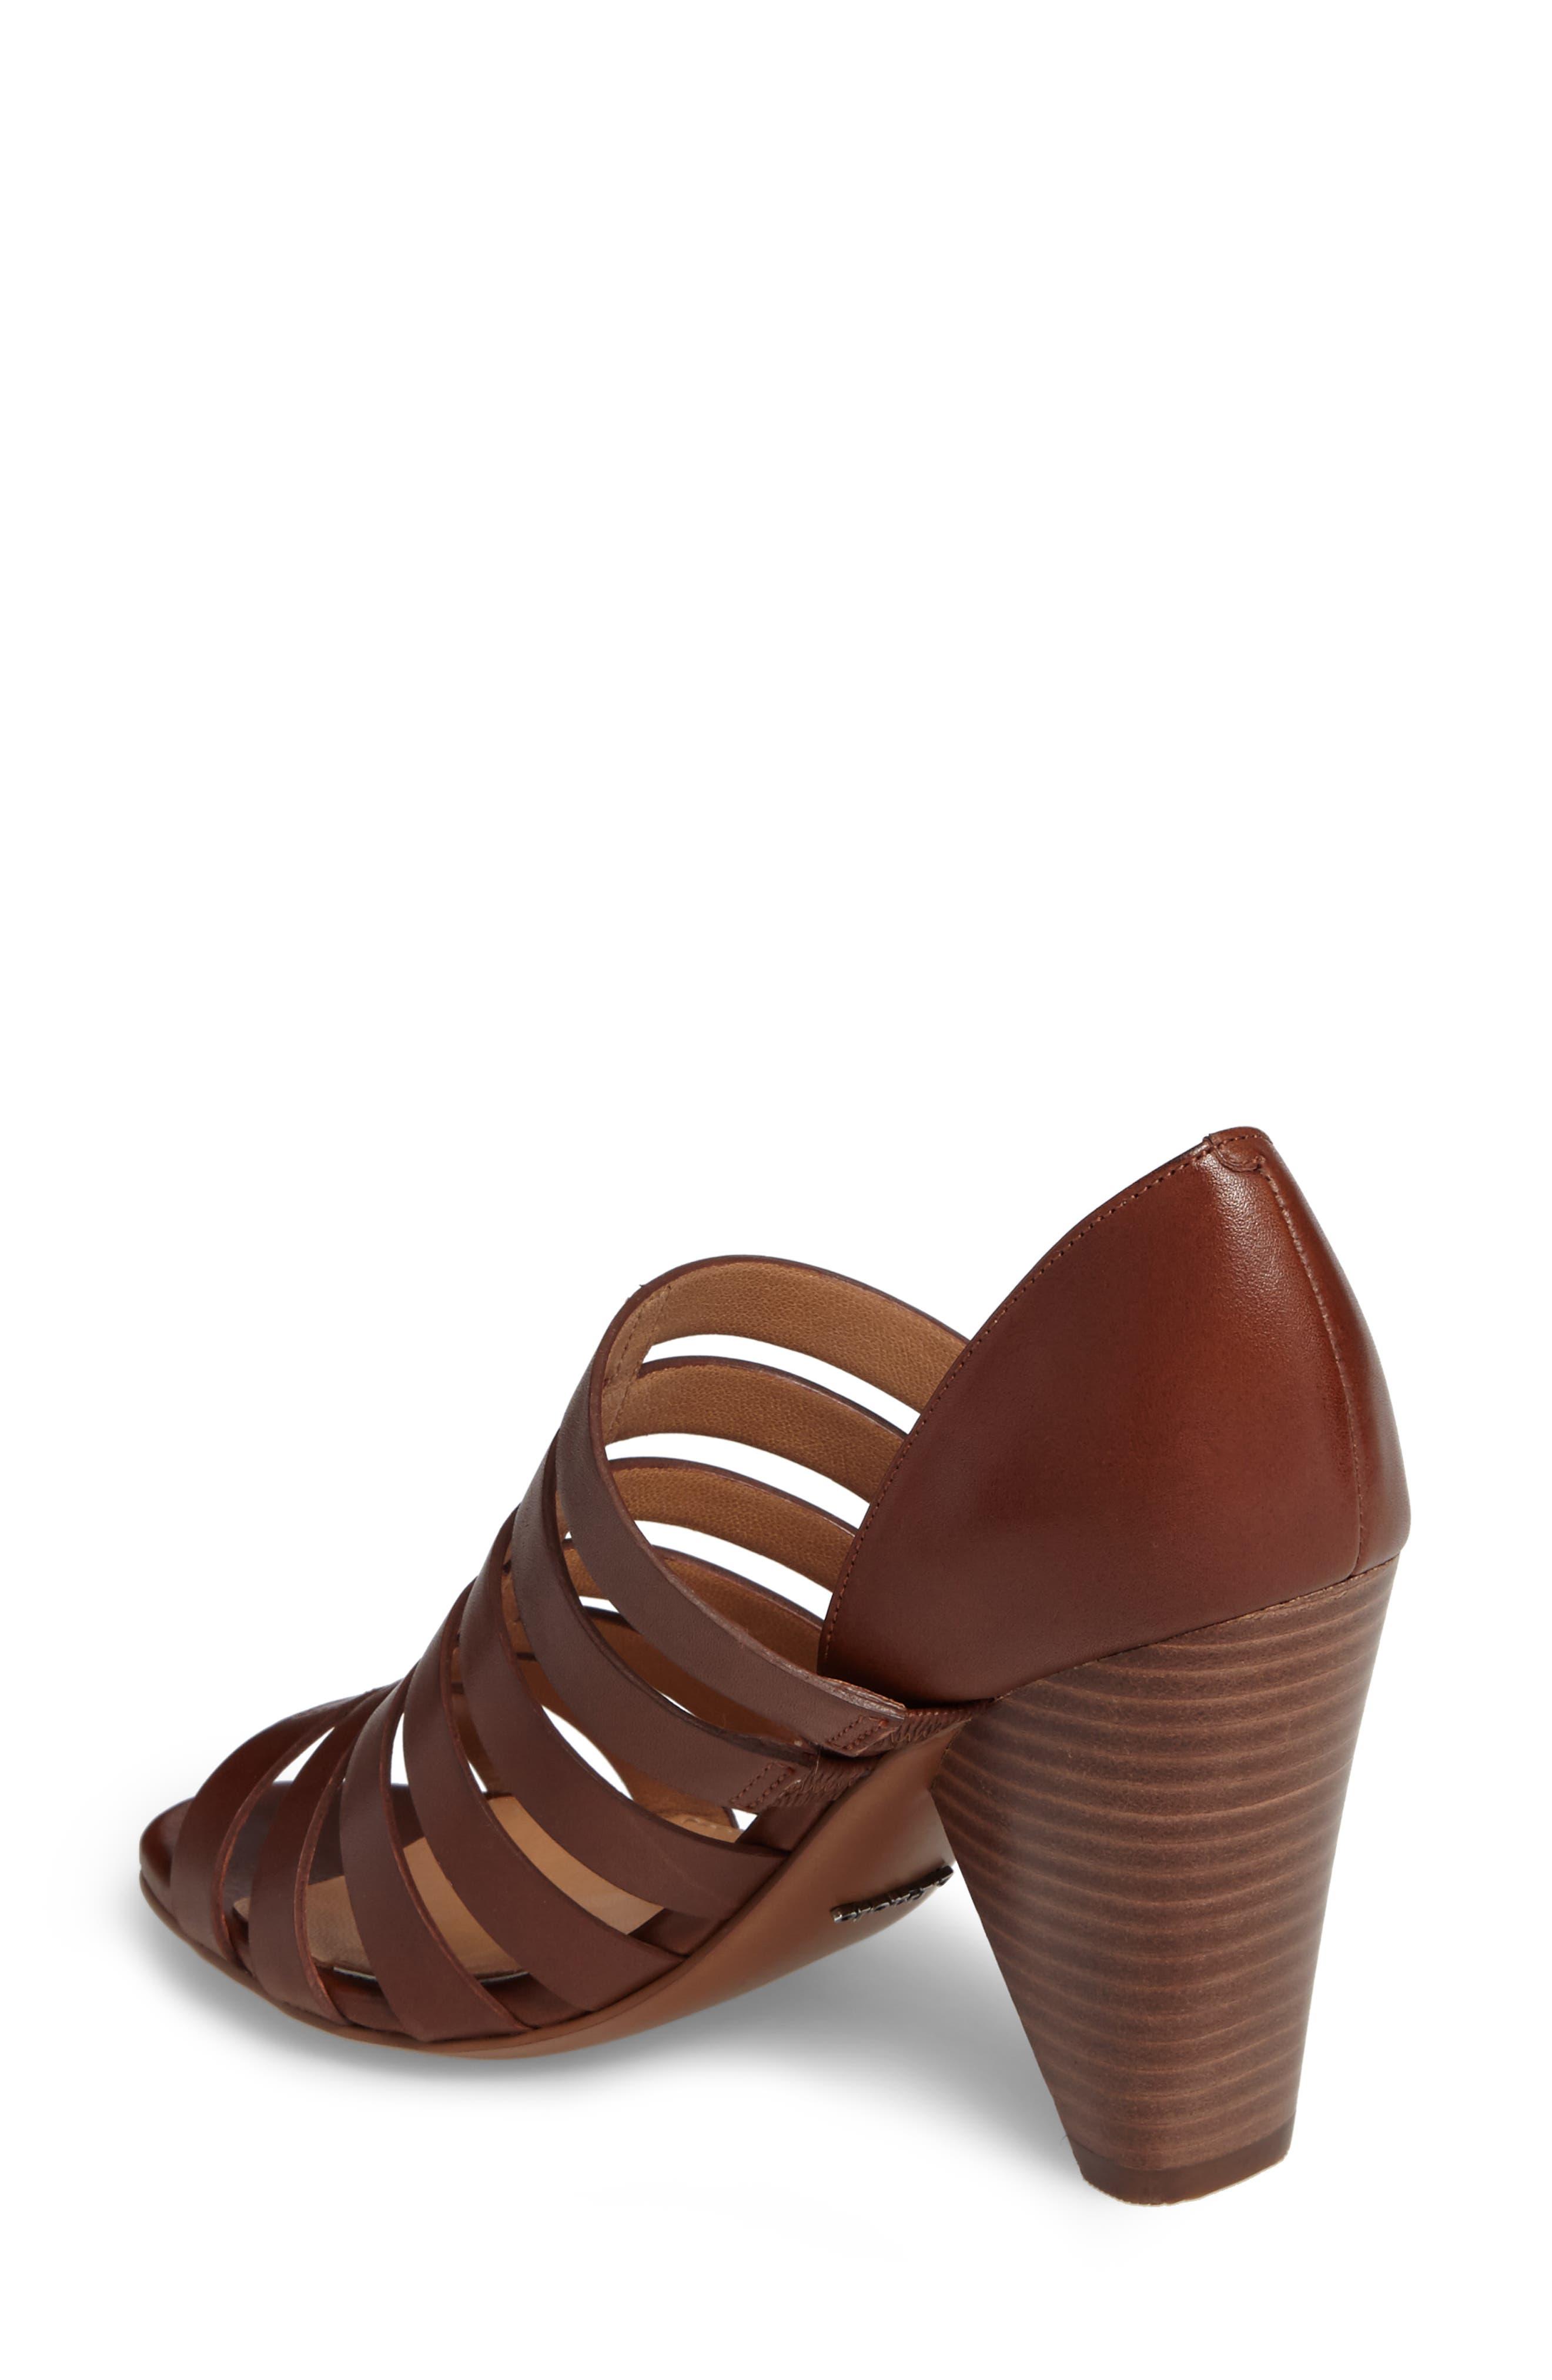 Alternate Image 2  - Linea Paolo Pierce Chisel Heel Cage Sandal (Women)